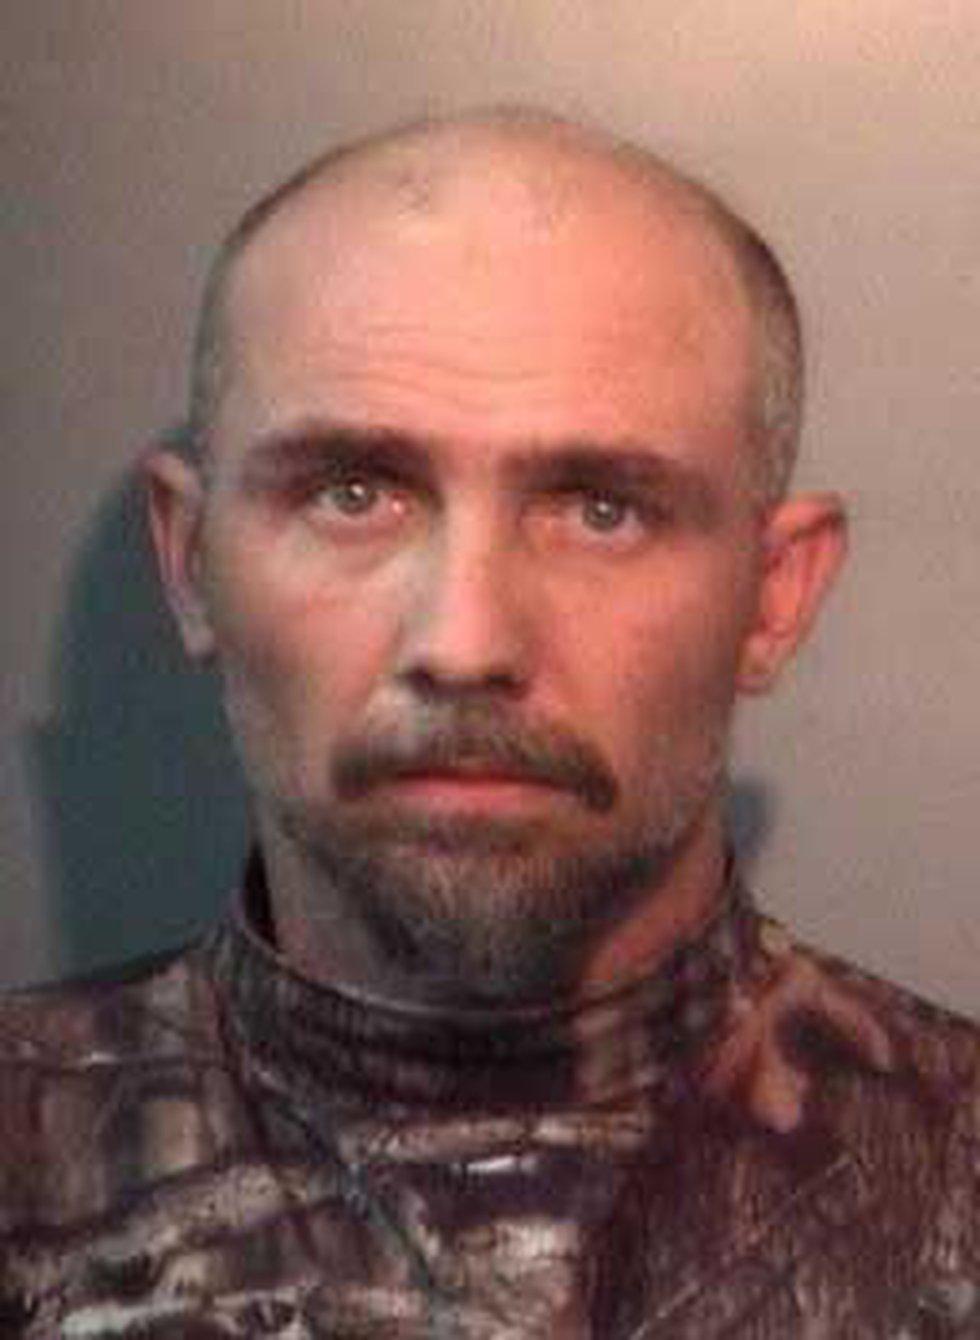 Eric Keeling (Source: Hardin County Detention Center)